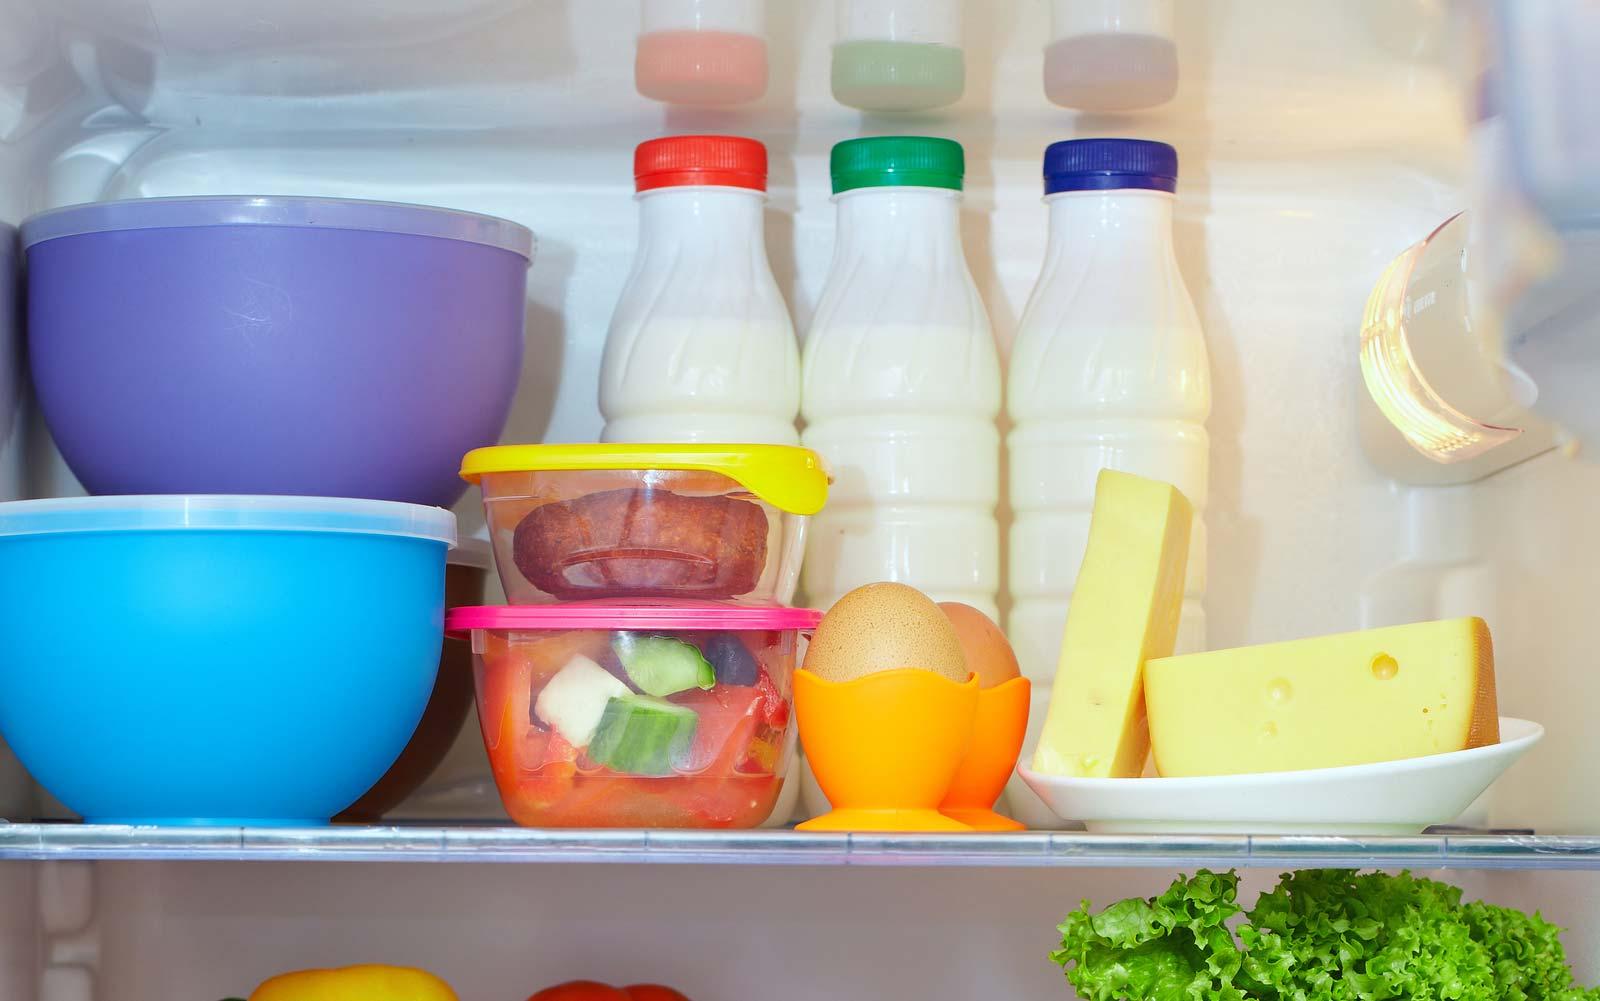 Como organizar geladeira: primeira prateleira